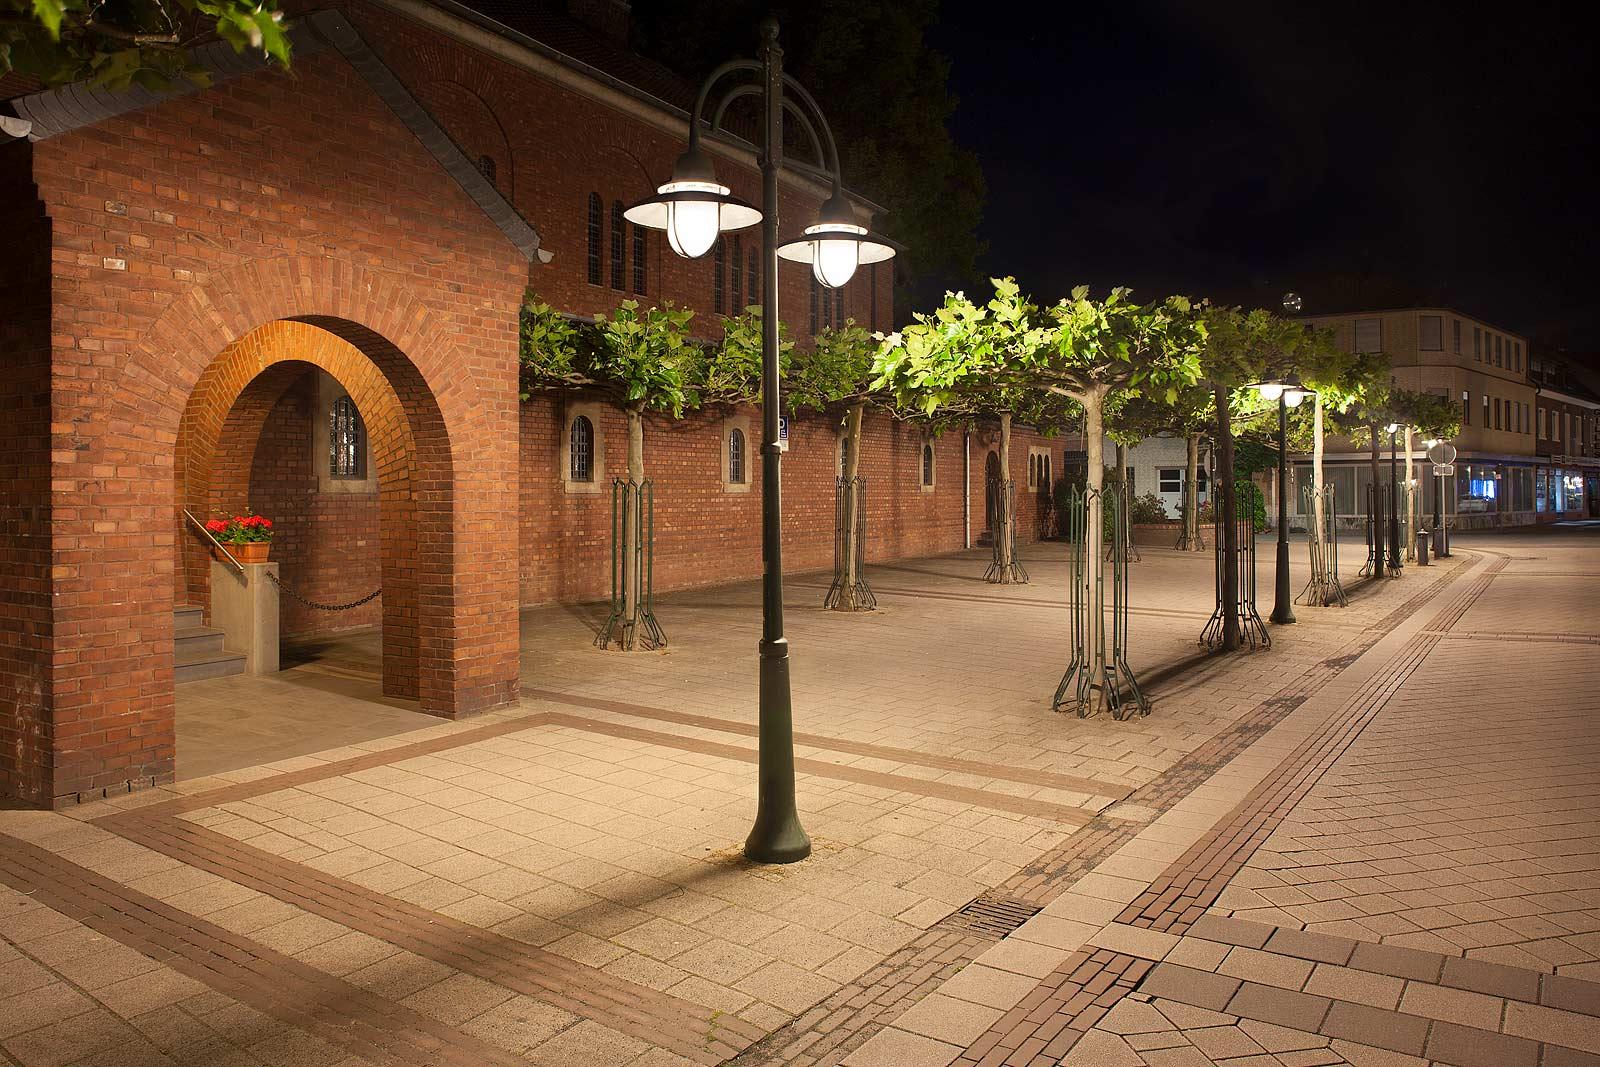 lichtfotografie-radium-kevelaer-historische-beleuchtung.jpg